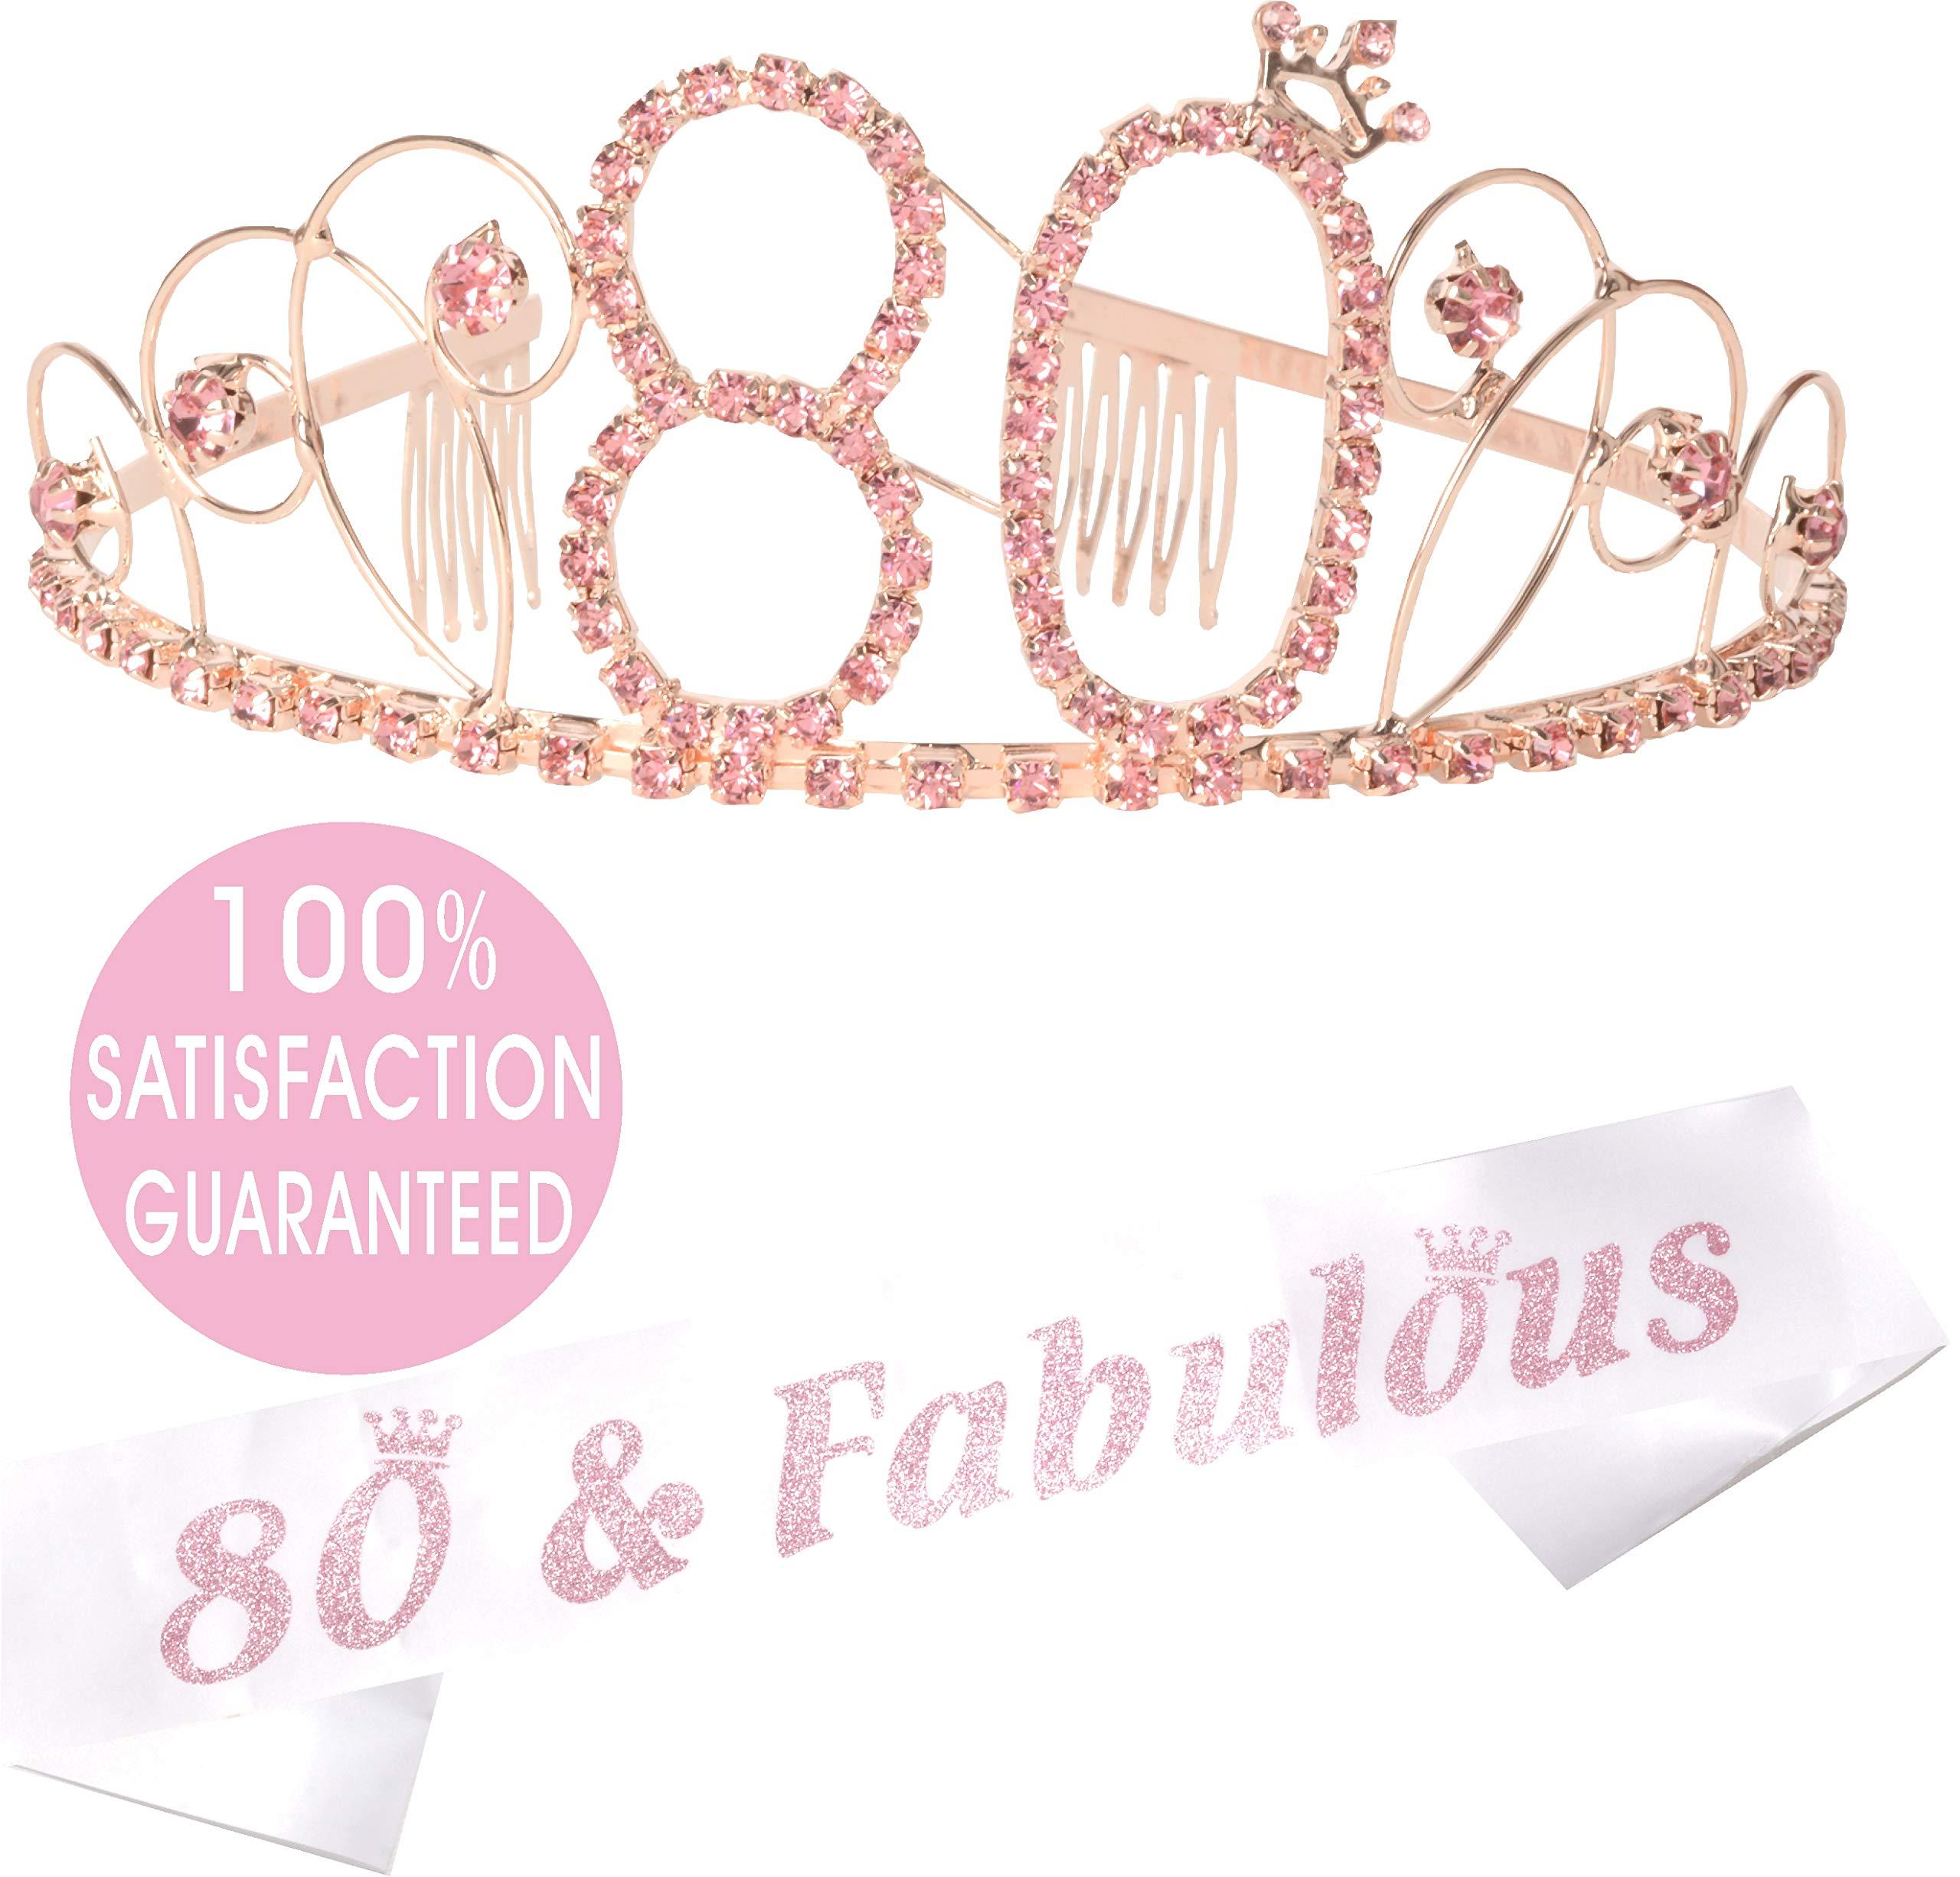 80th Birthday Gold Tiara and Sash, Happy 80th Birthday Party Supplies, 80th Black Gold Glitter Satin Sash and Crystal Tiara Birthday Gold Crown for 80th Birthday Party Supplies and Decorations (Pink)